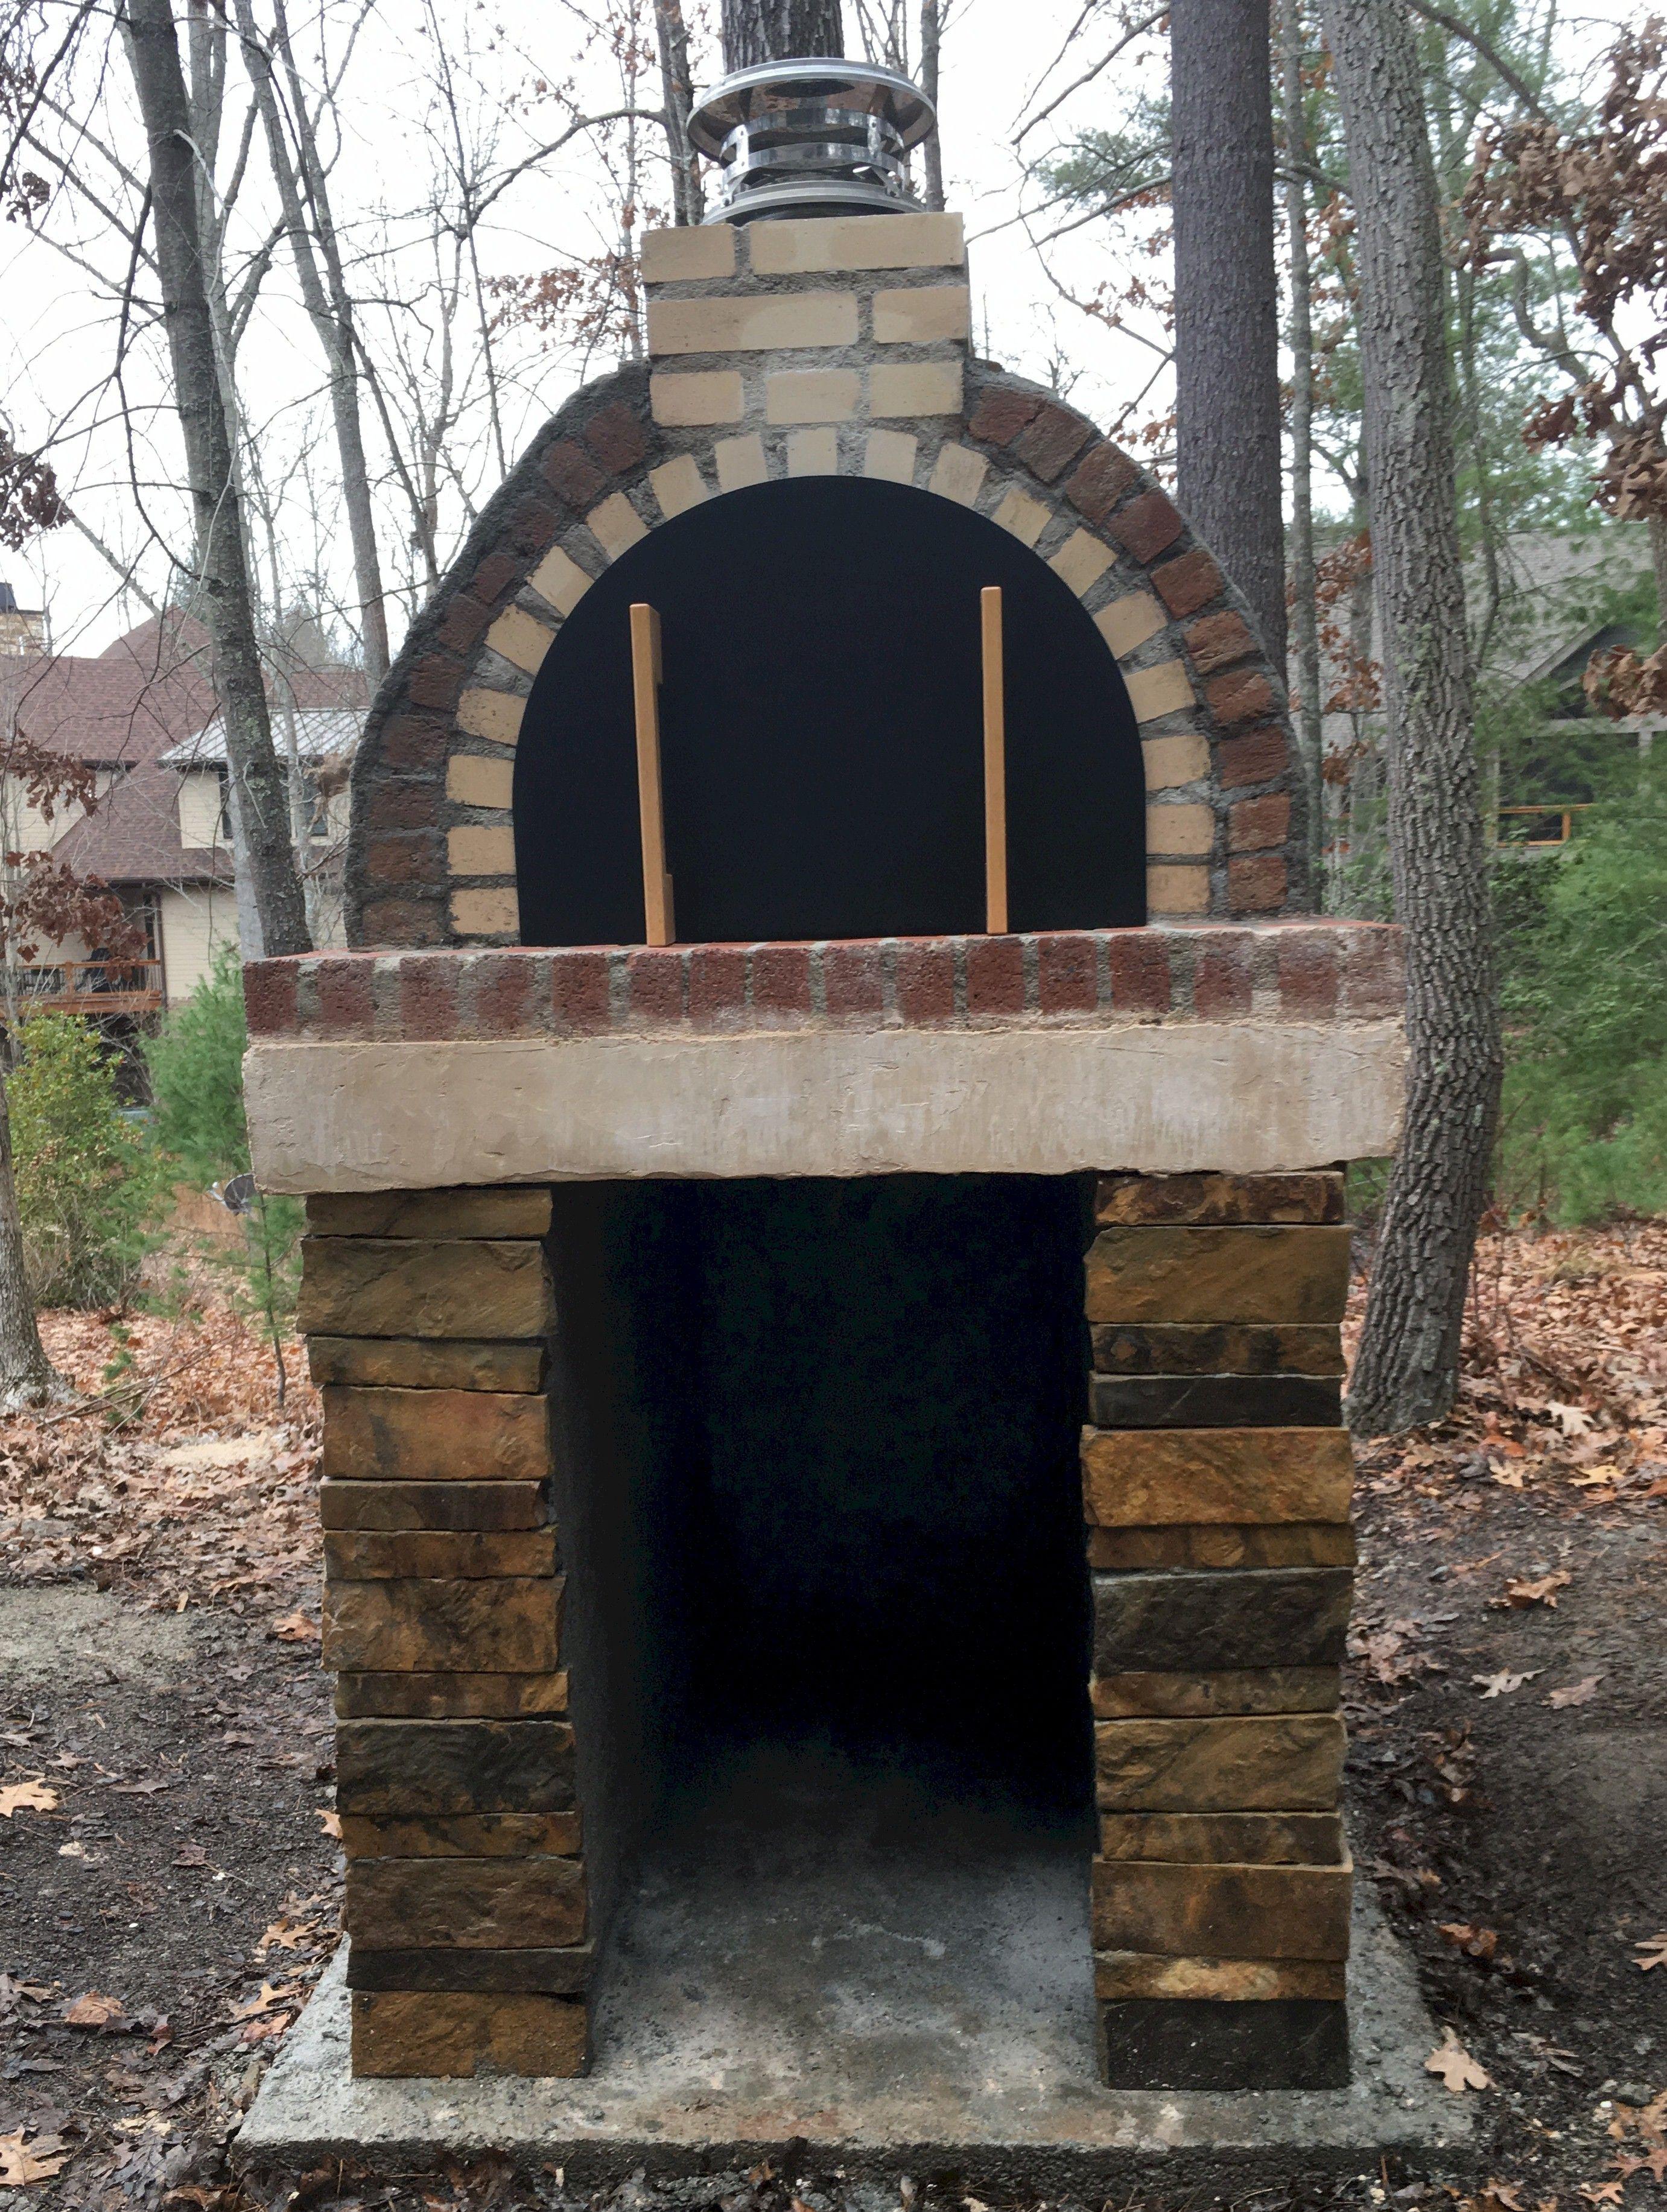 OUTDOOR BRICK OVEN SLEATER Brick pizza oven, Brick